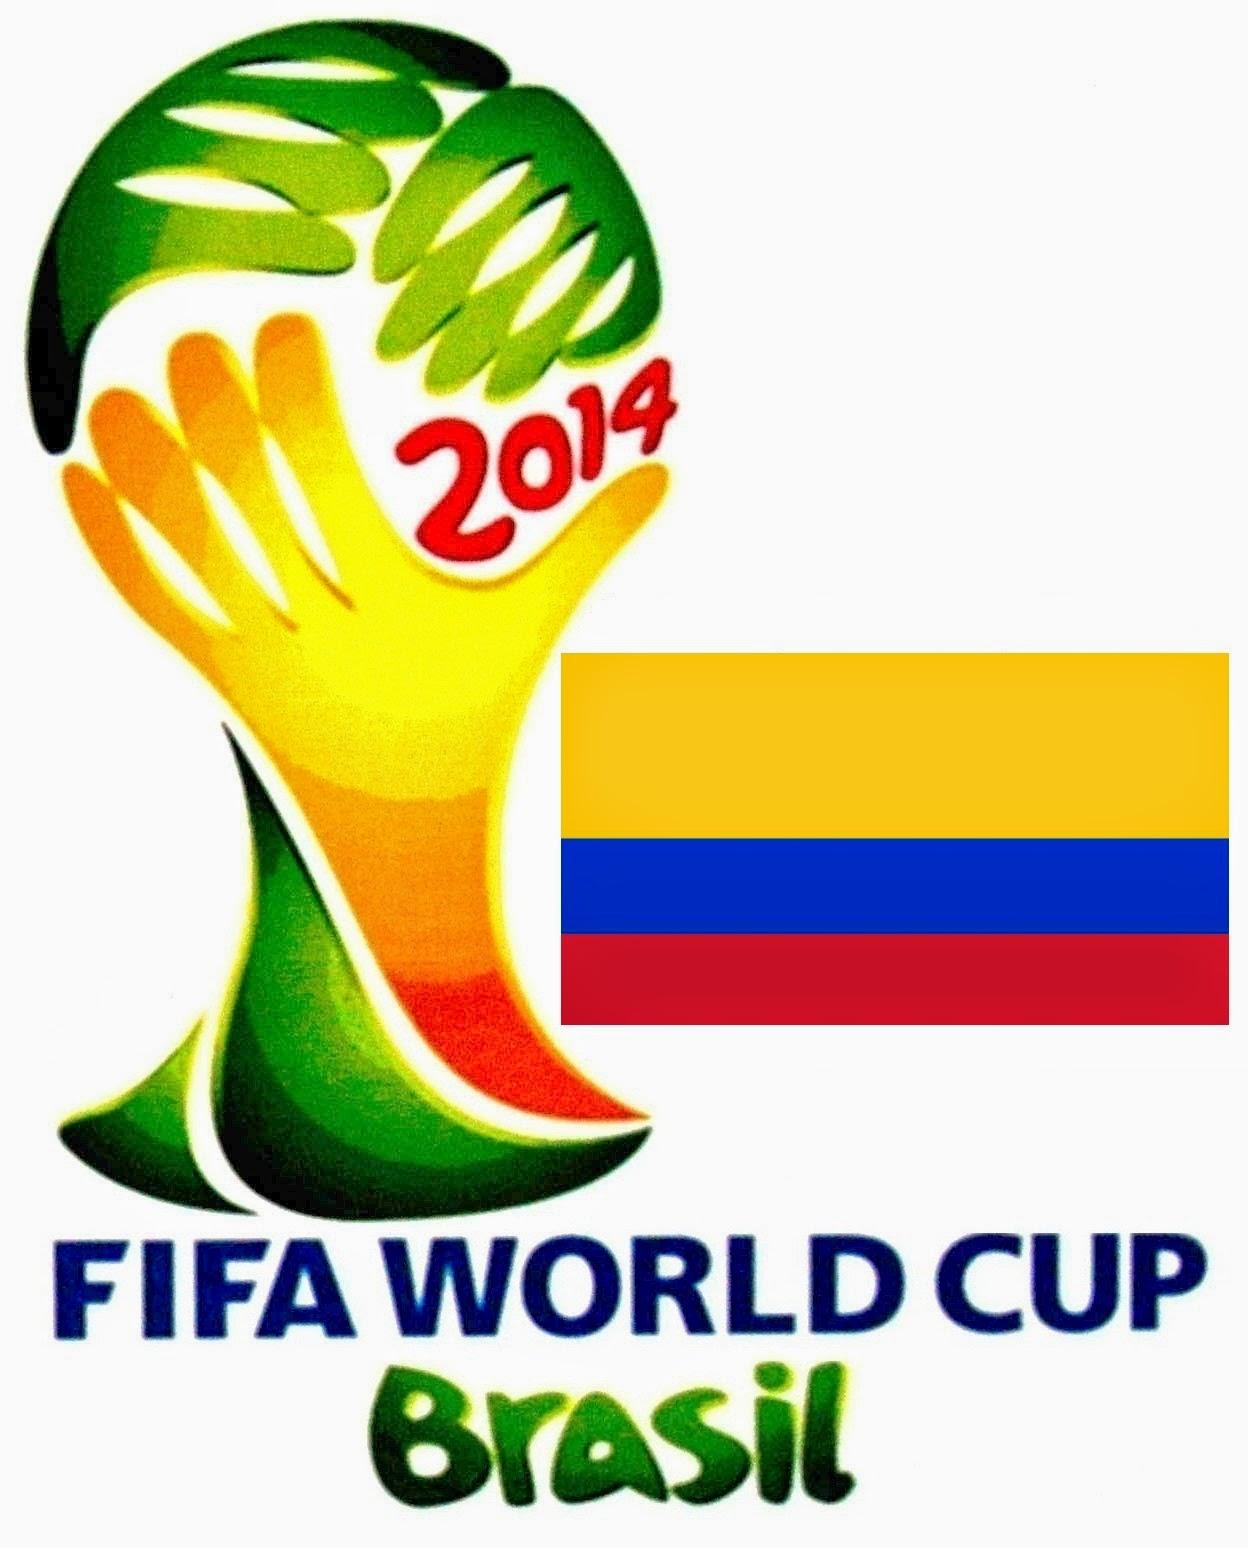 Daftar Nama Pemain Timnas Kolombia Piala Dunia 2014